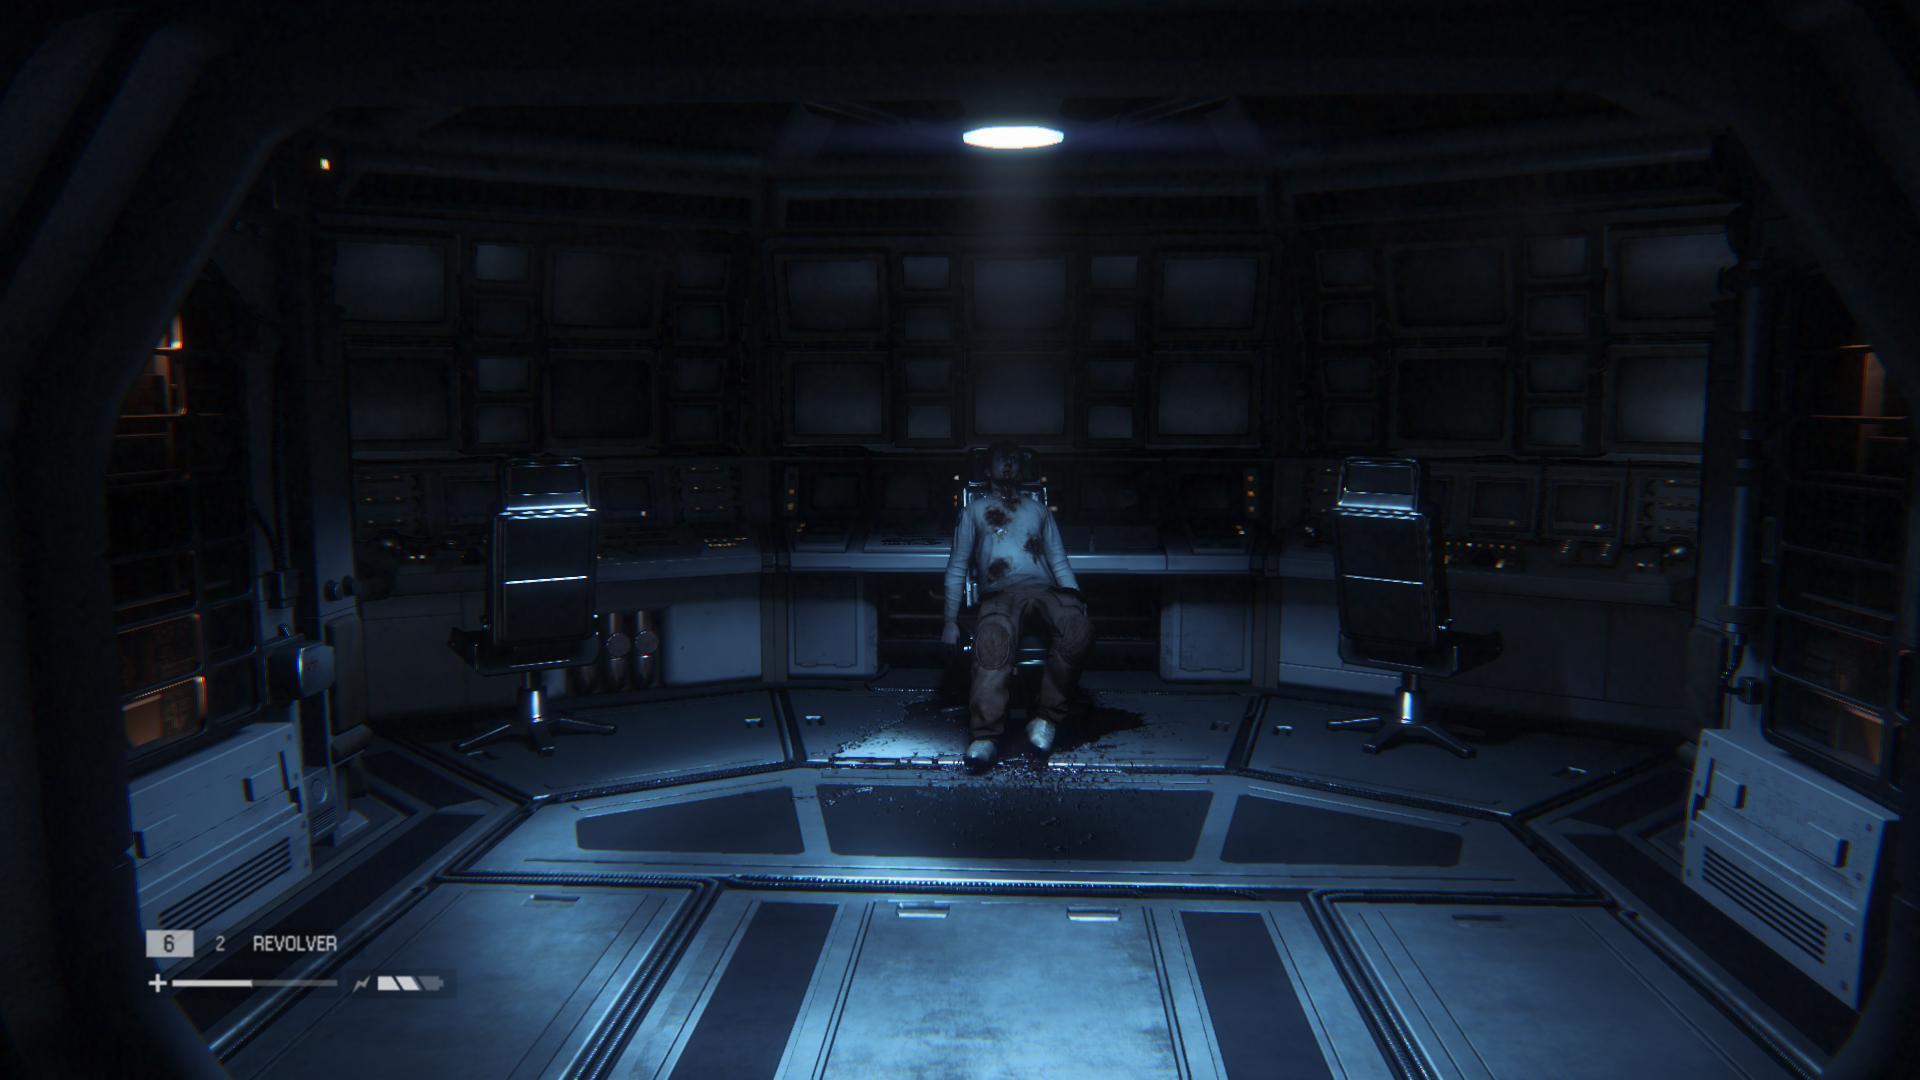 Recenze Alien: Isolation - Patnáct hodin v izolaci 9613